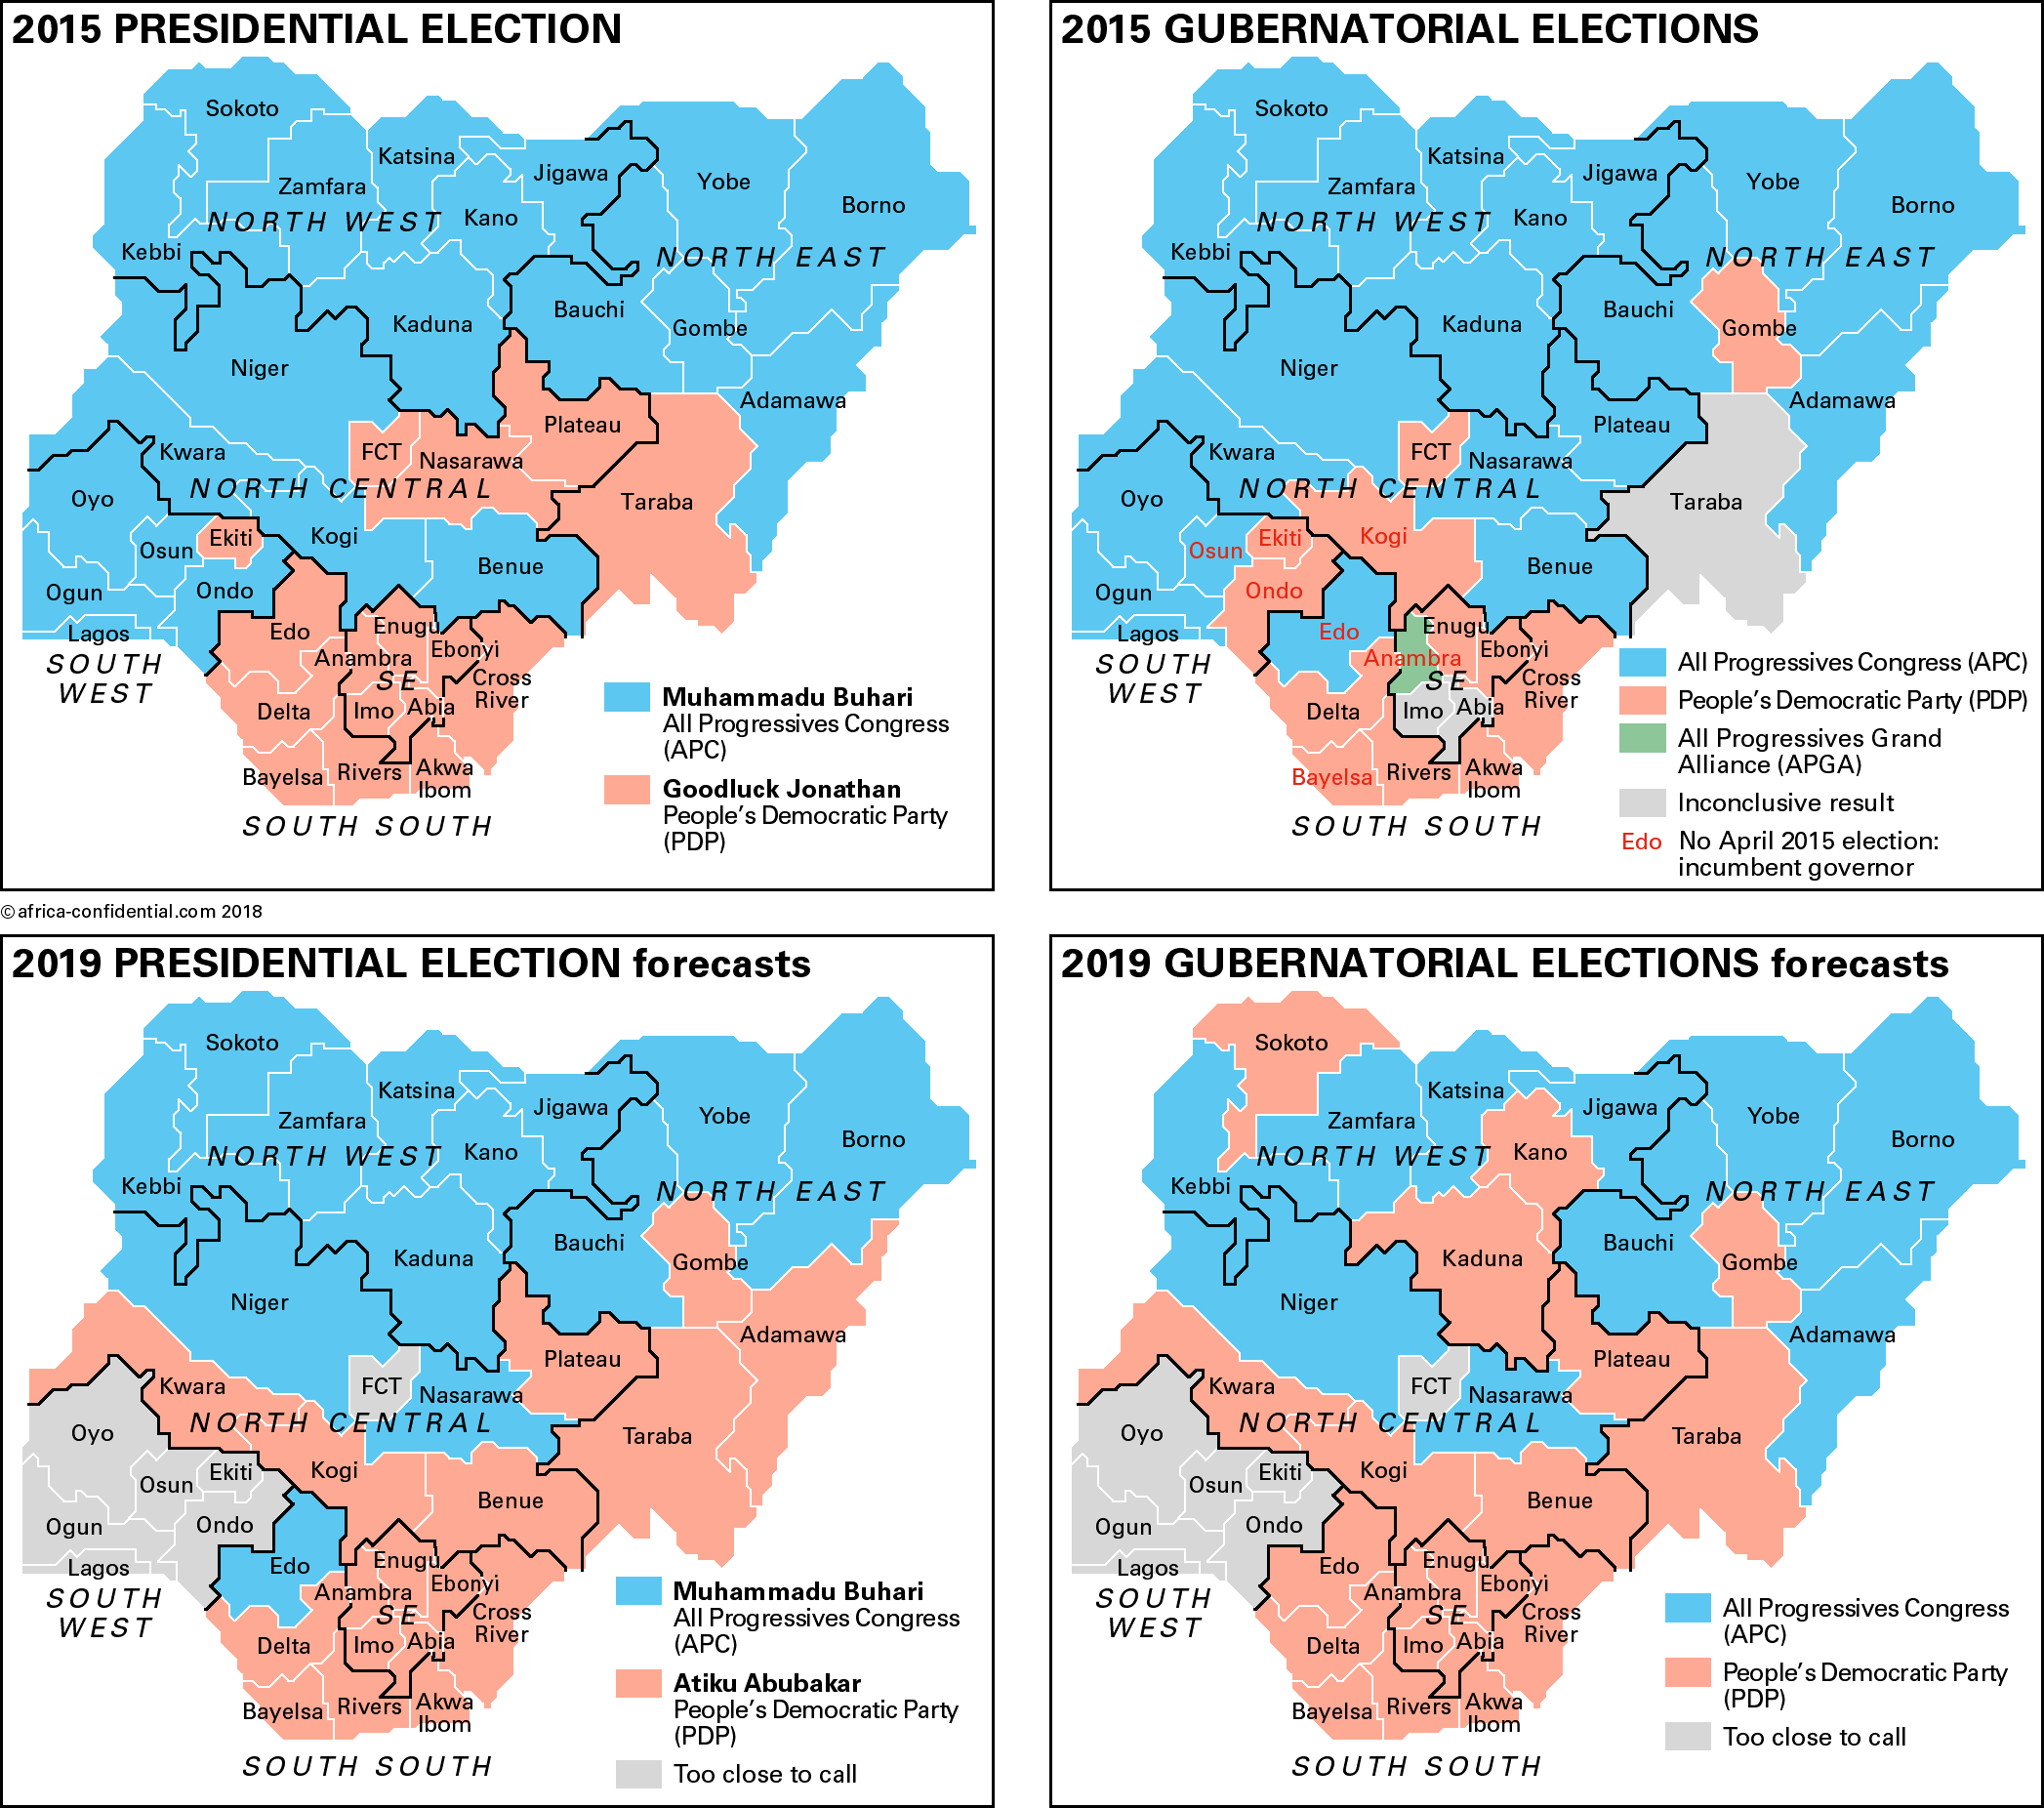 Nigeria Elections Maps Copyright © Africa Confidential 2018